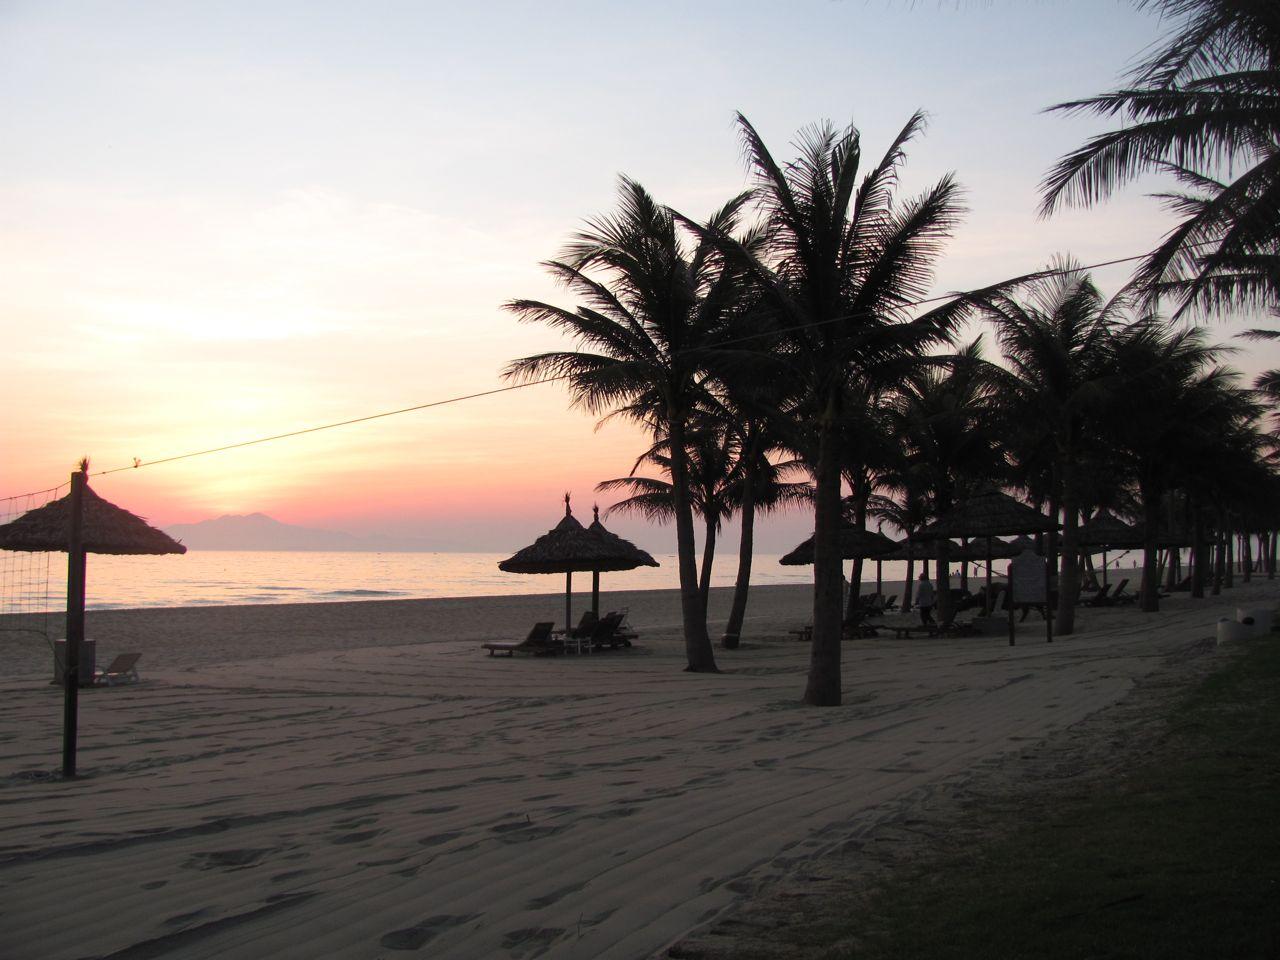 Sunrise at Cua Dai Beach